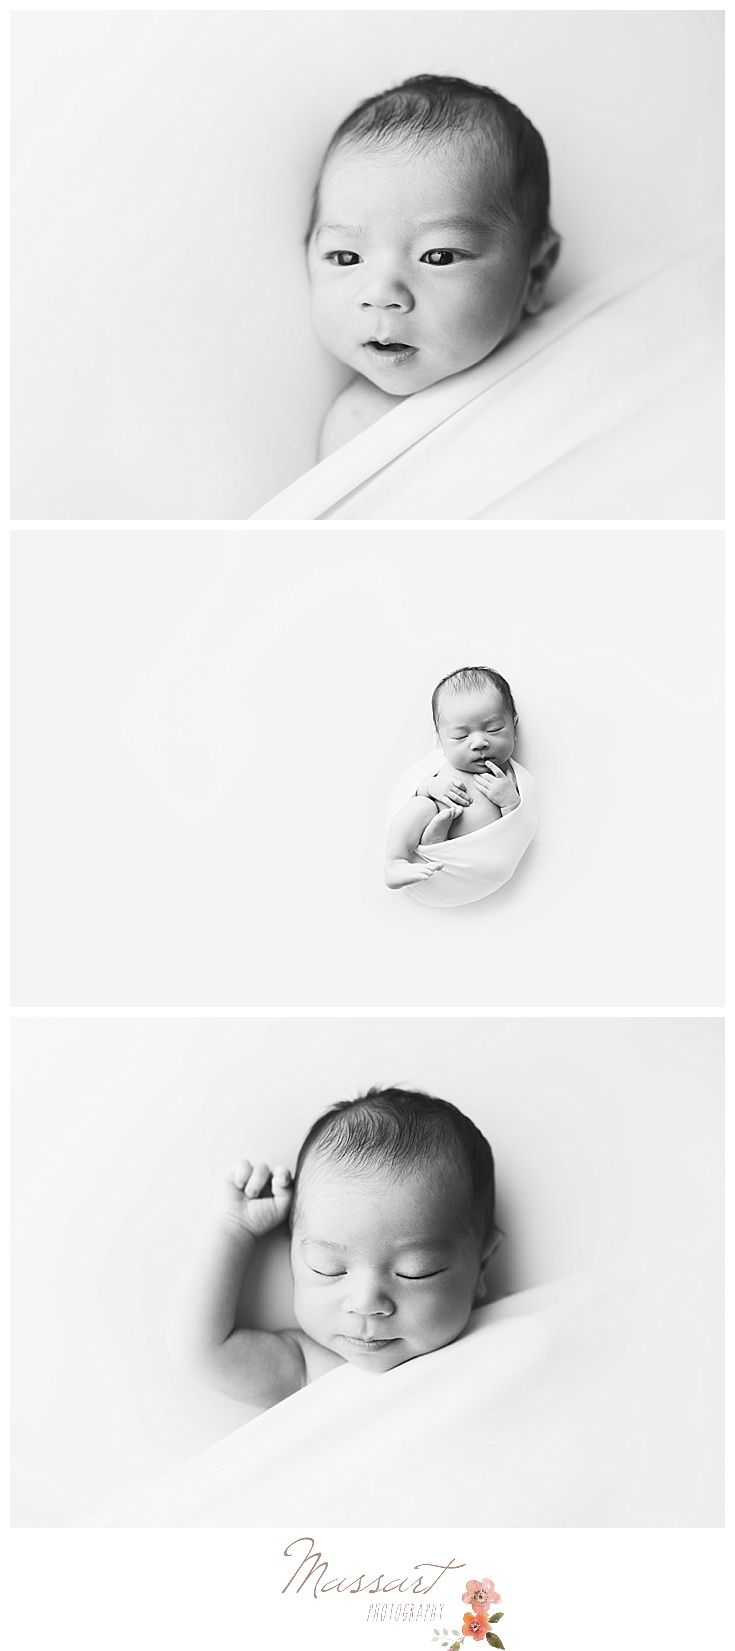 Black and white newborn baby boy studio portraits photographed by Massart Photography, a RI newborn, family and wedding photographer. www.massartphotography.com; info@massartphotography.com